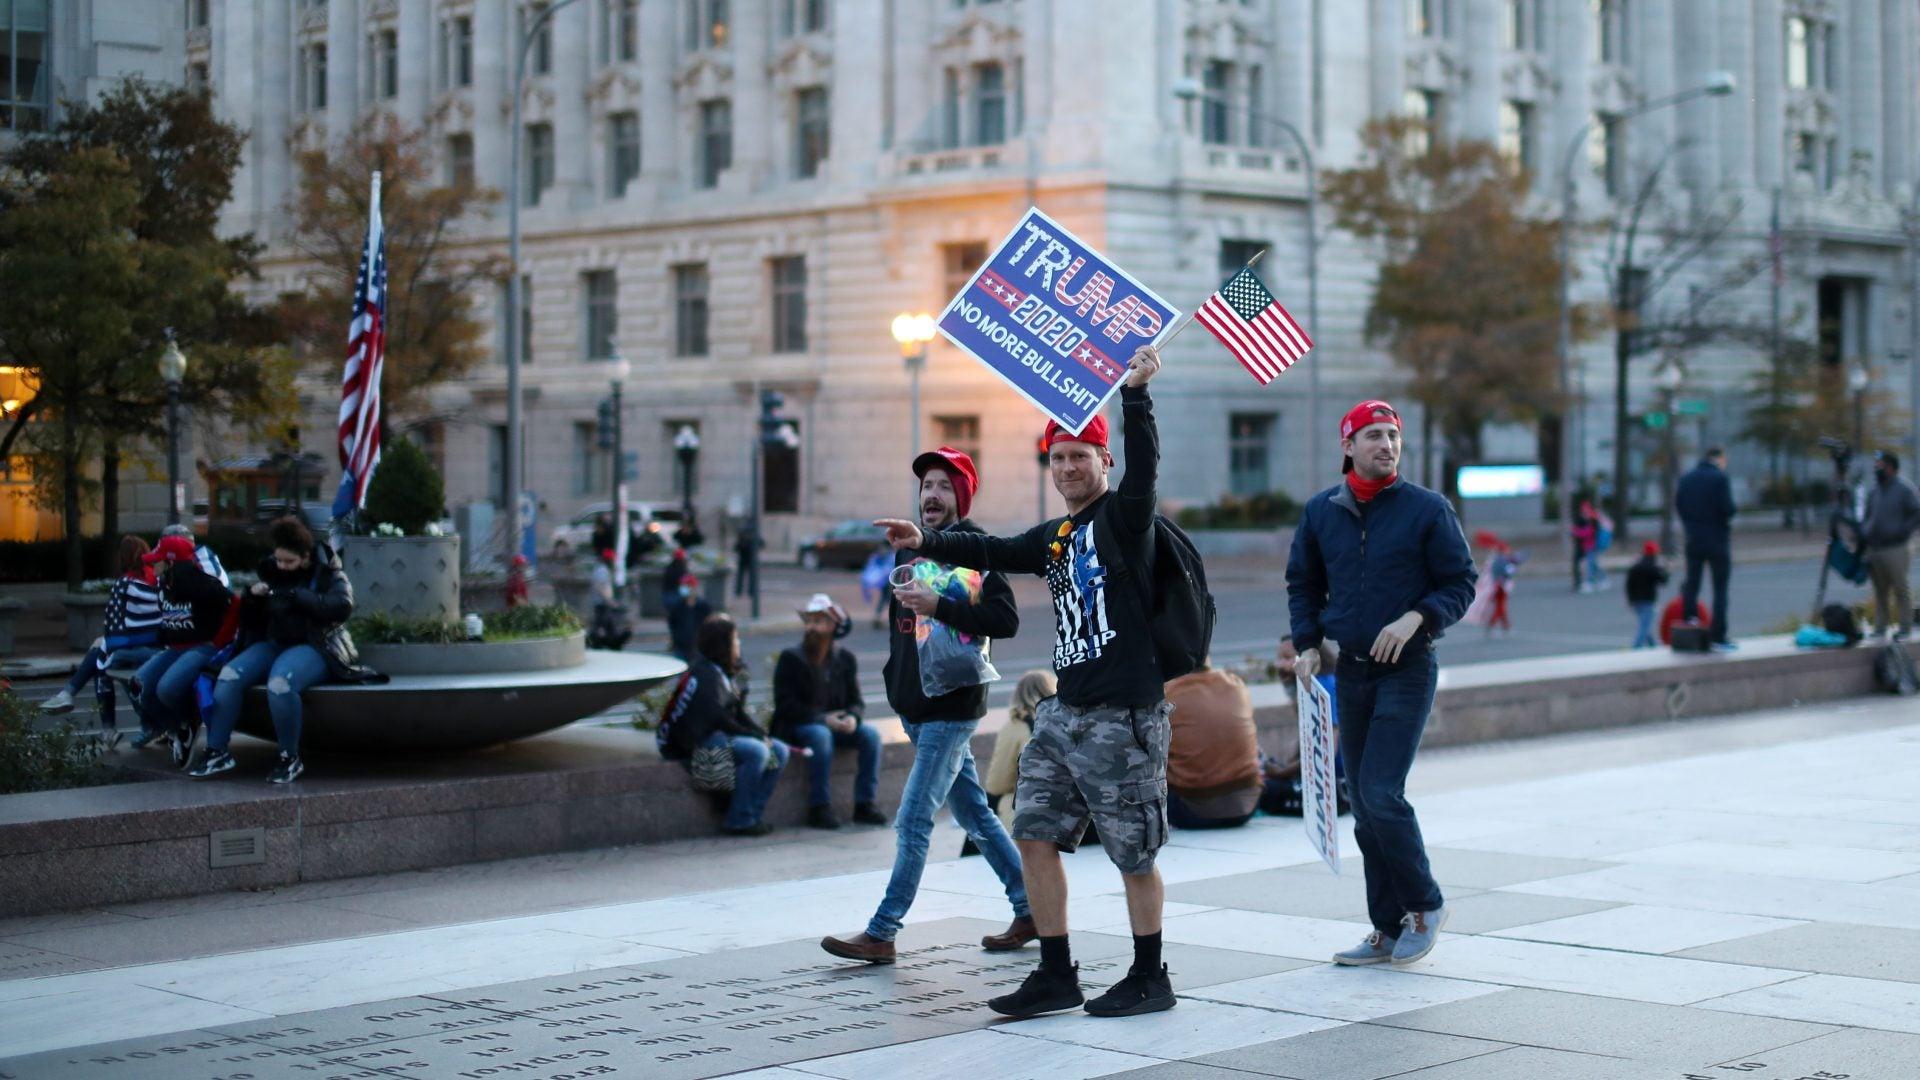 'Million MAGA March' In Washington D.C. Ends In Violence, Arrests